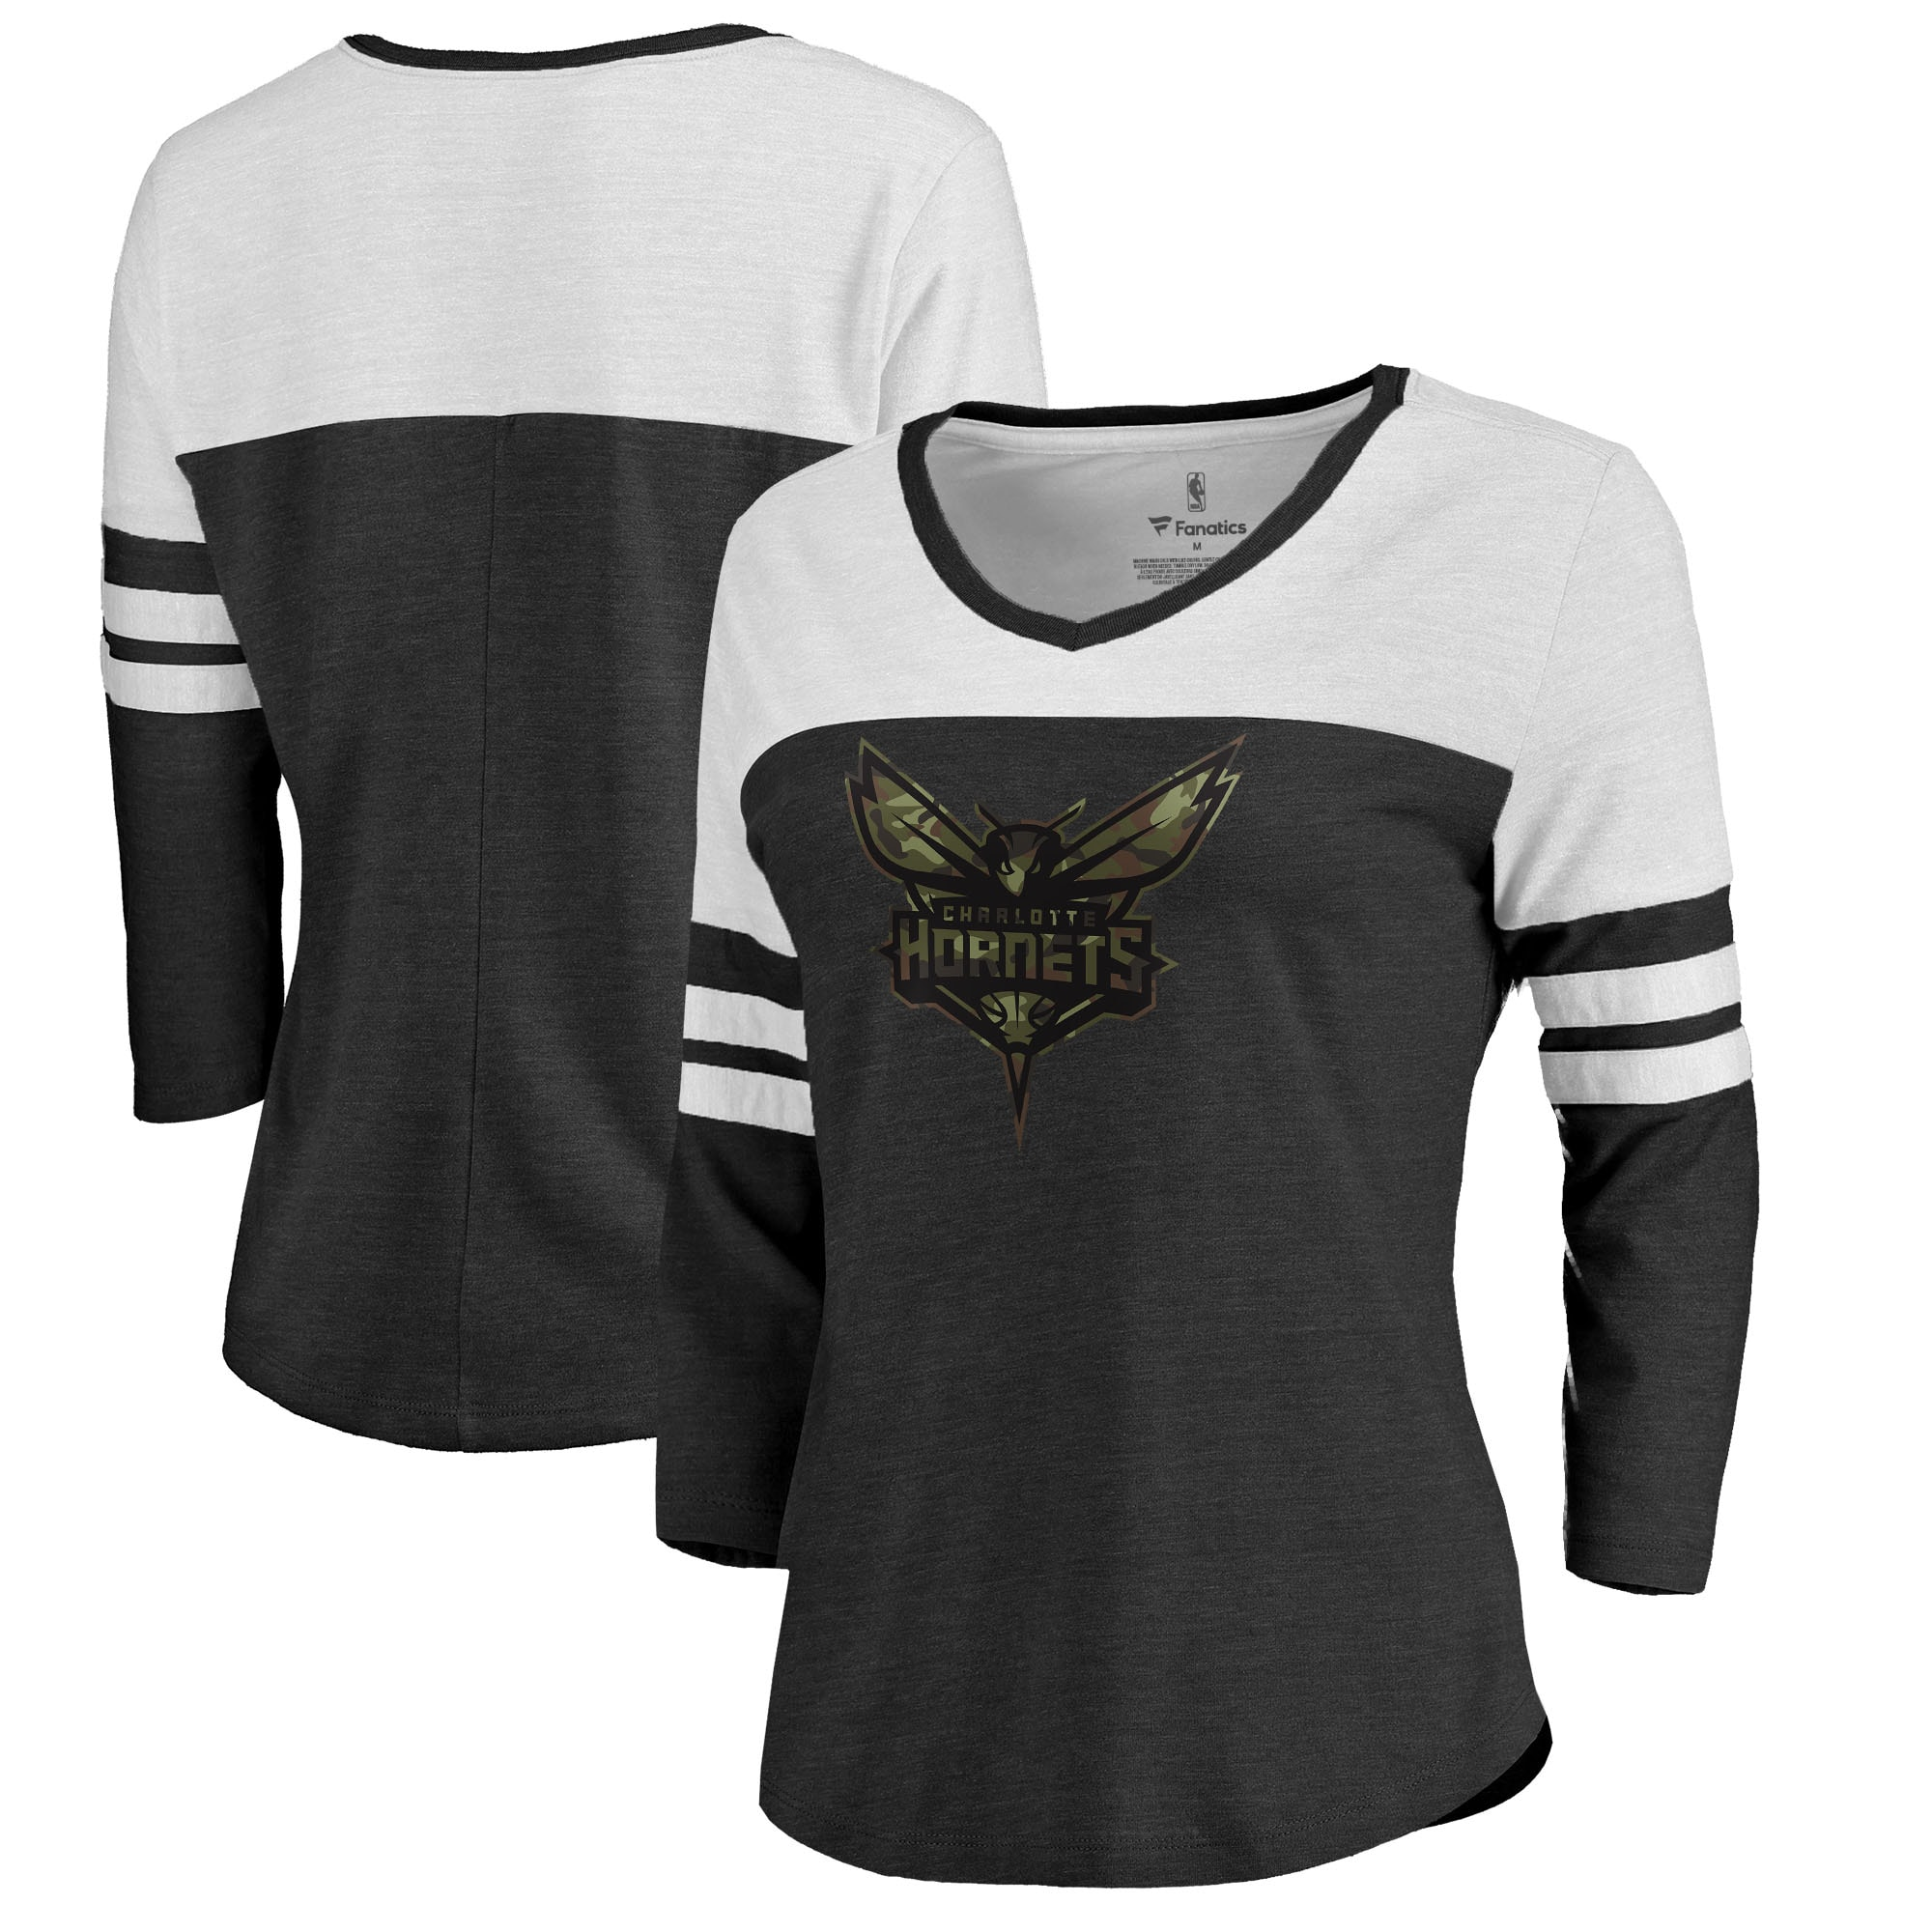 Charlotte Hornets Fanatics Branded Women's Prestige Camo 3/4-Sleeve Raglan T-Shirt - Black